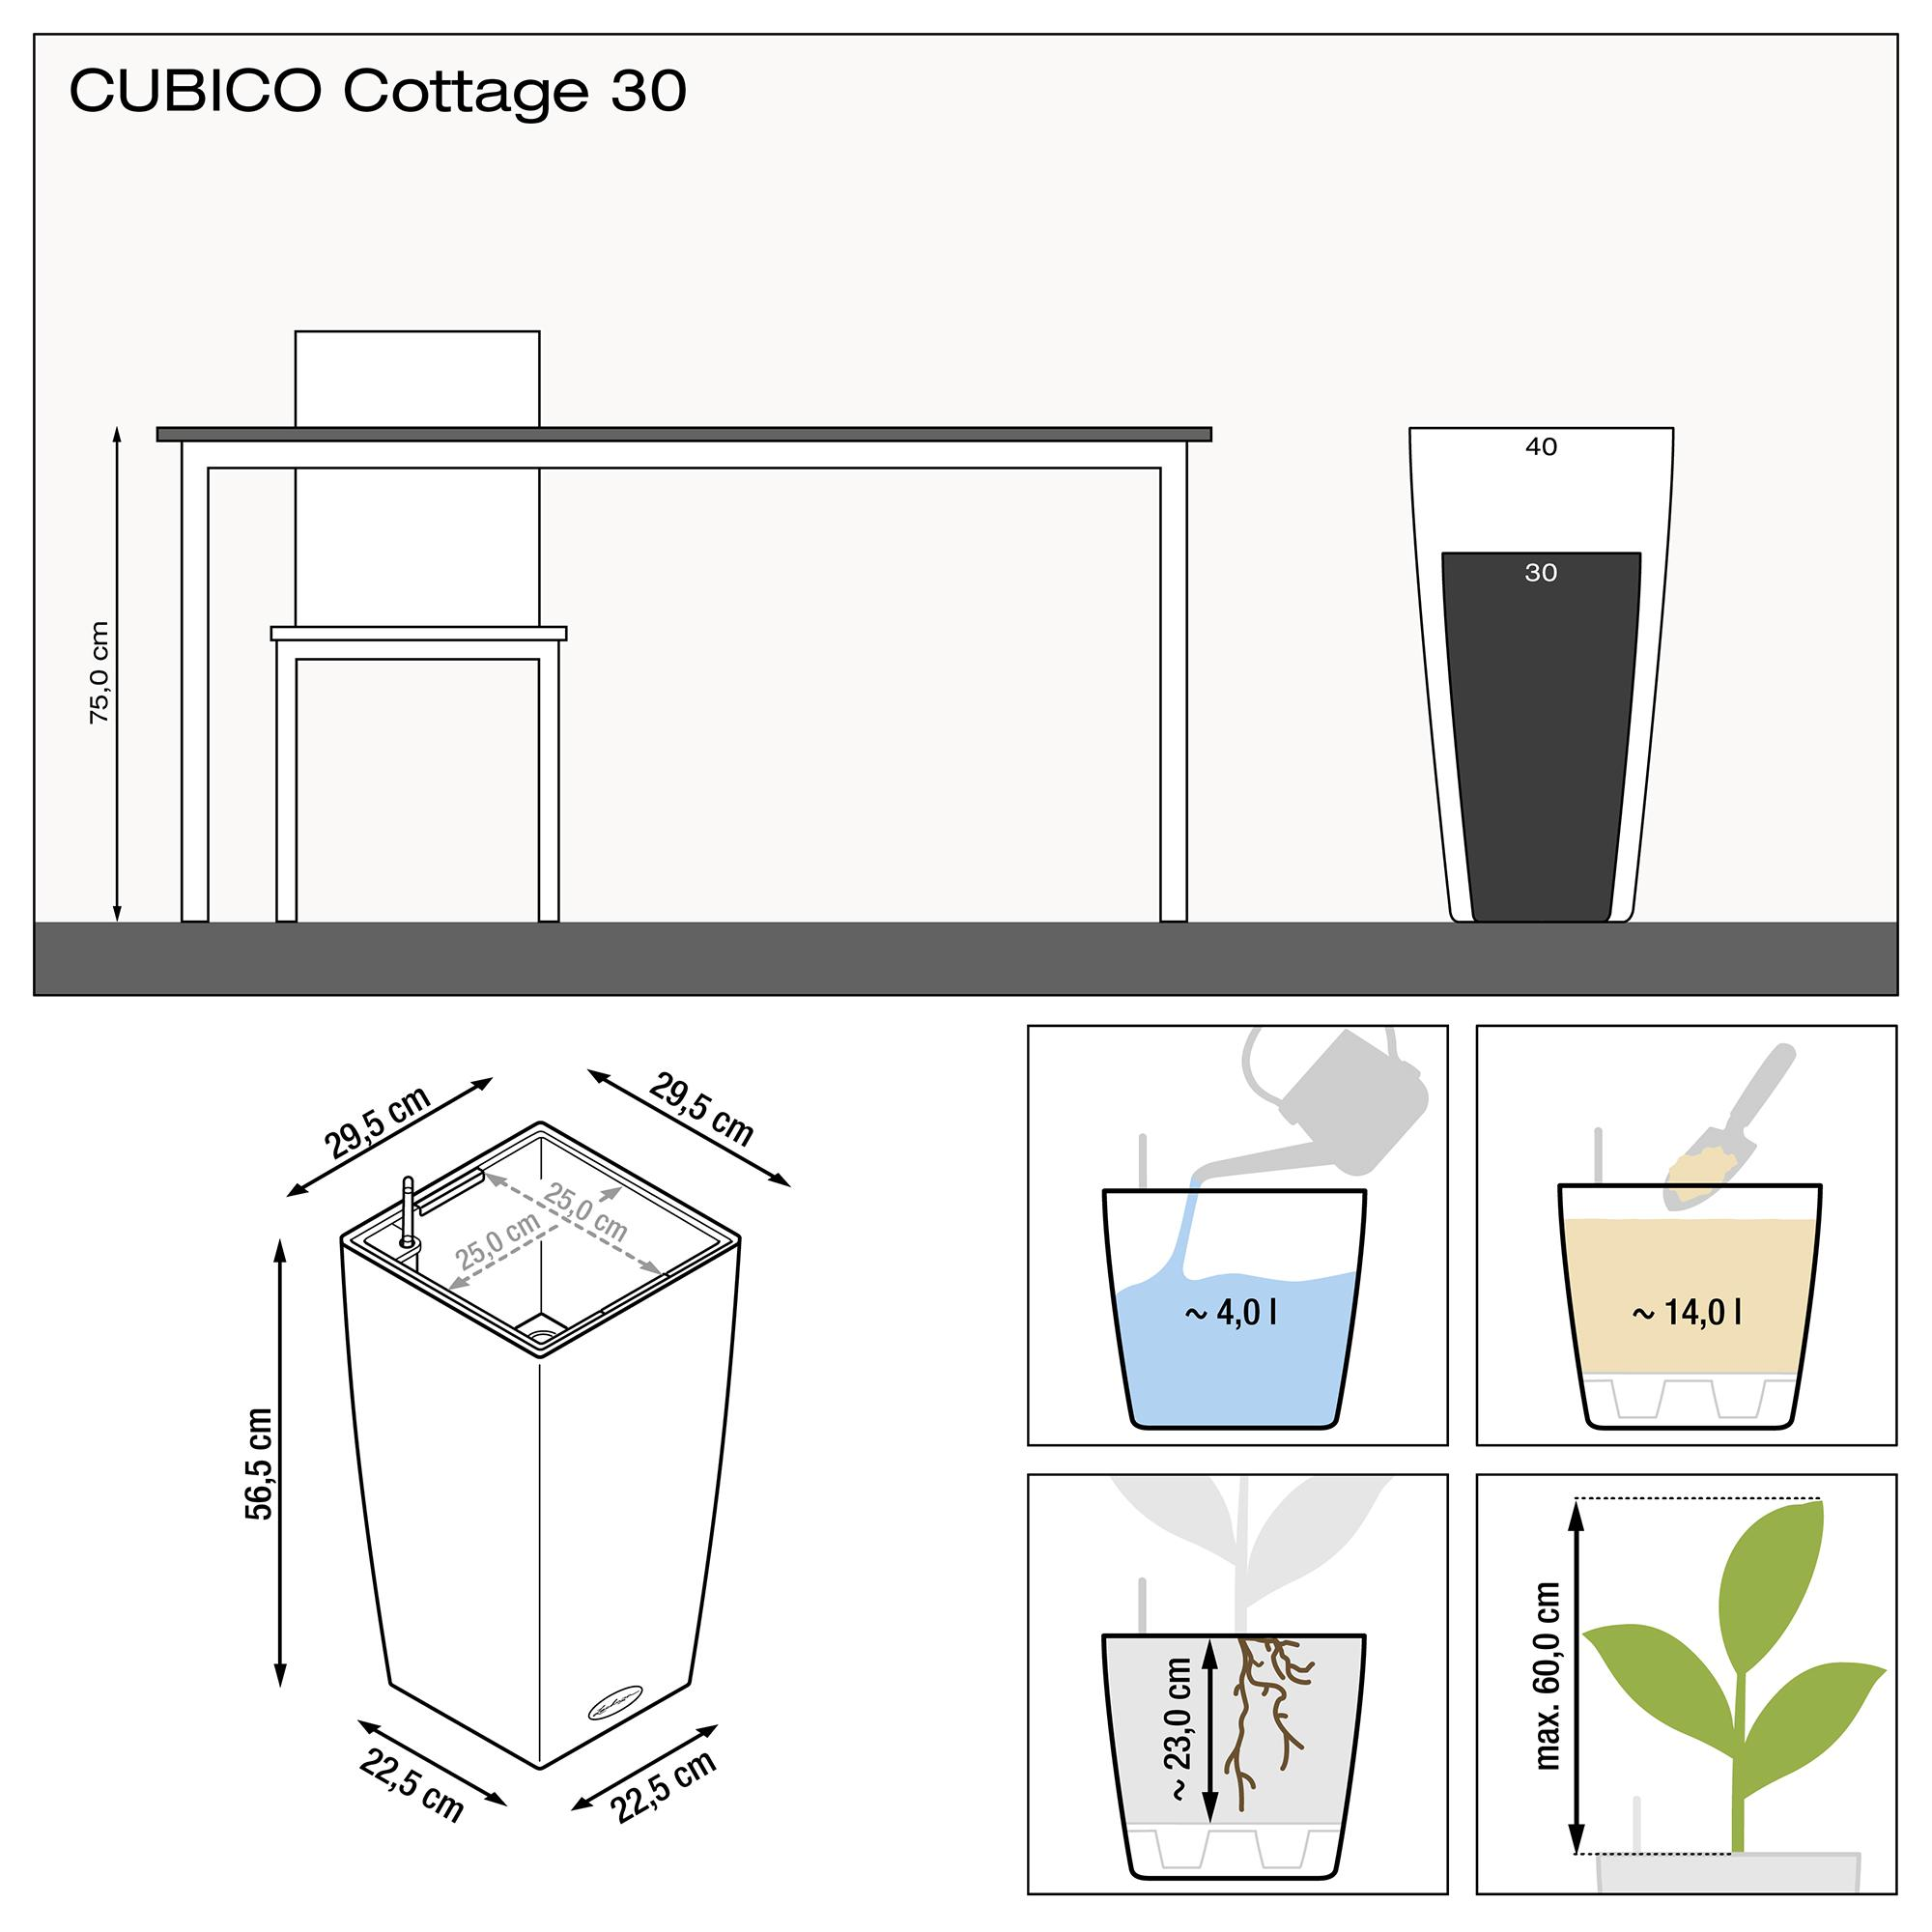 CUBICO Cottage 30 mocha - Image 3